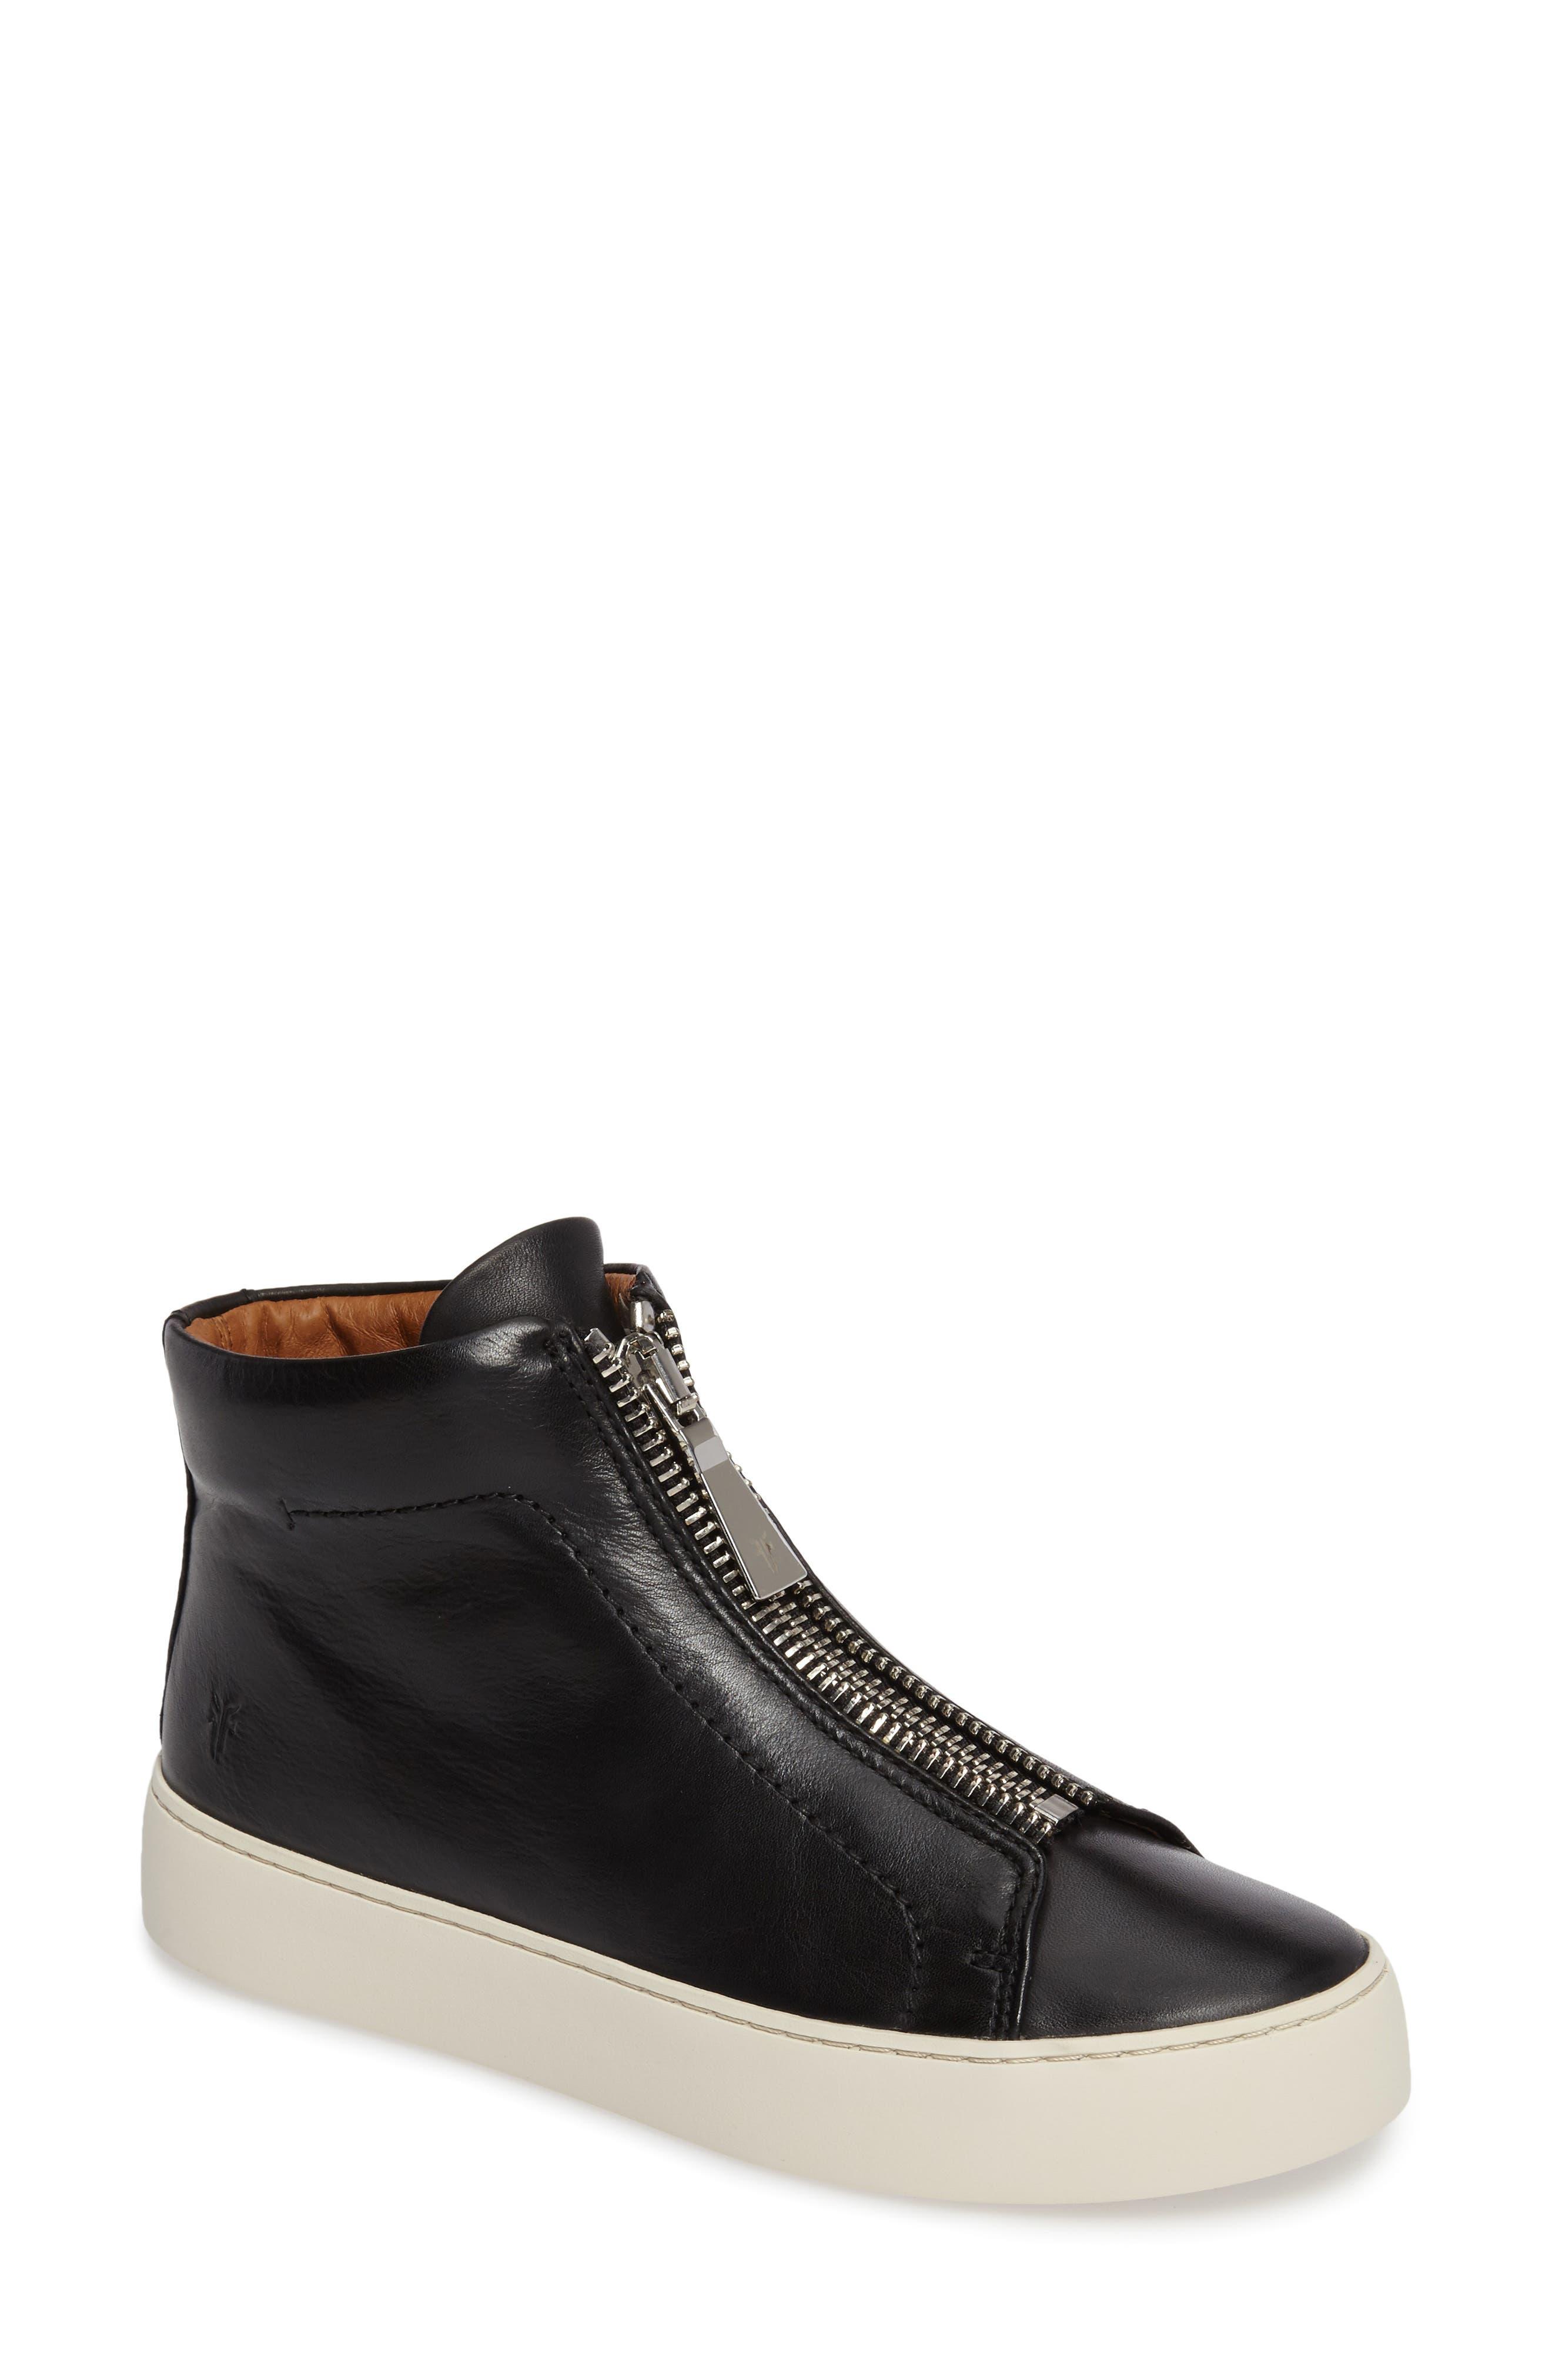 FRYE, Lena Zip High Top Sneaker, Main thumbnail 1, color, BLACK LEATHER